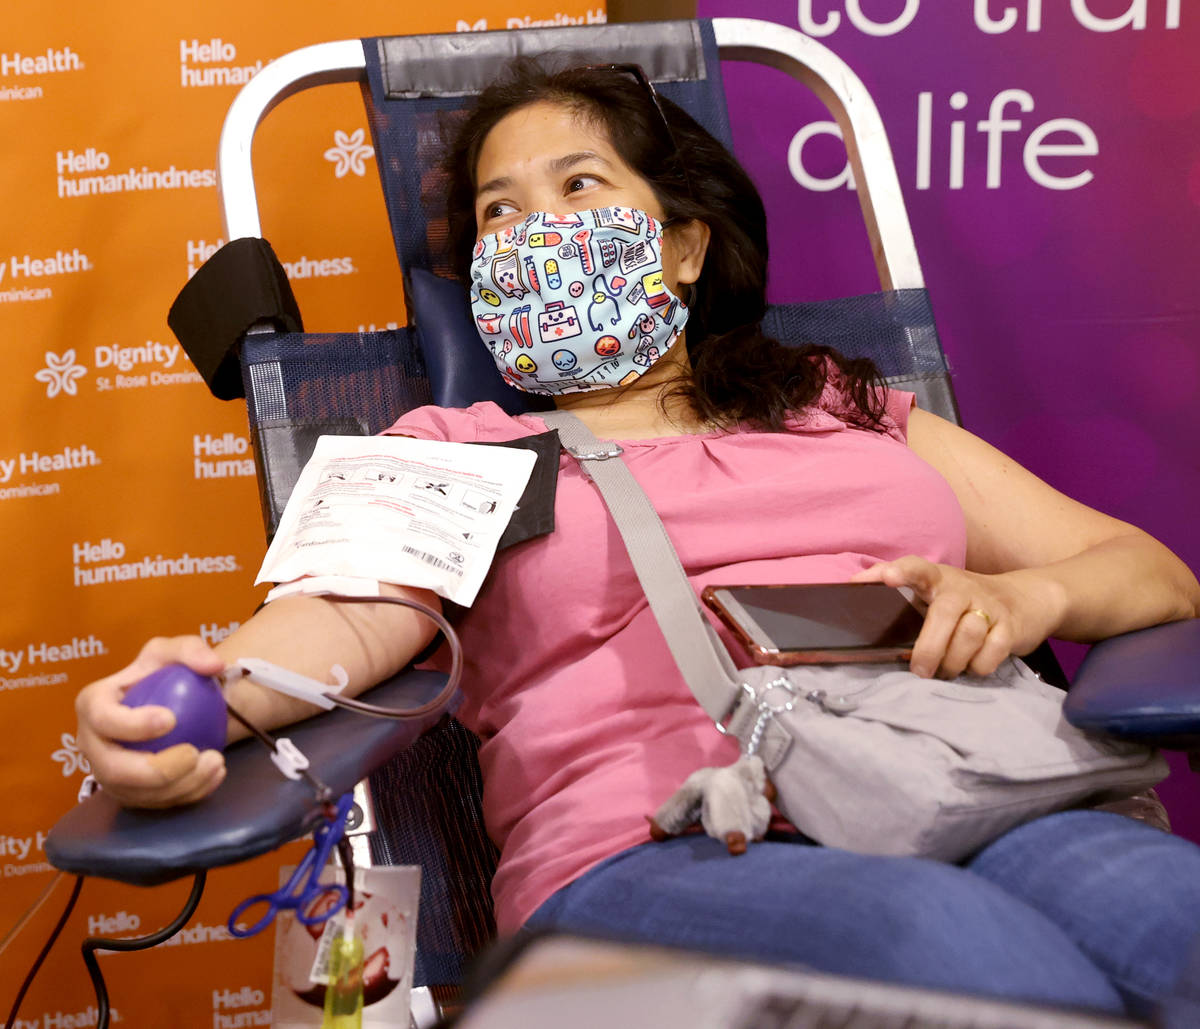 Lorena Guardian, 52, of Las Vegas donates plasma at St. Rose Dominican Hospital, Siena campus i ...